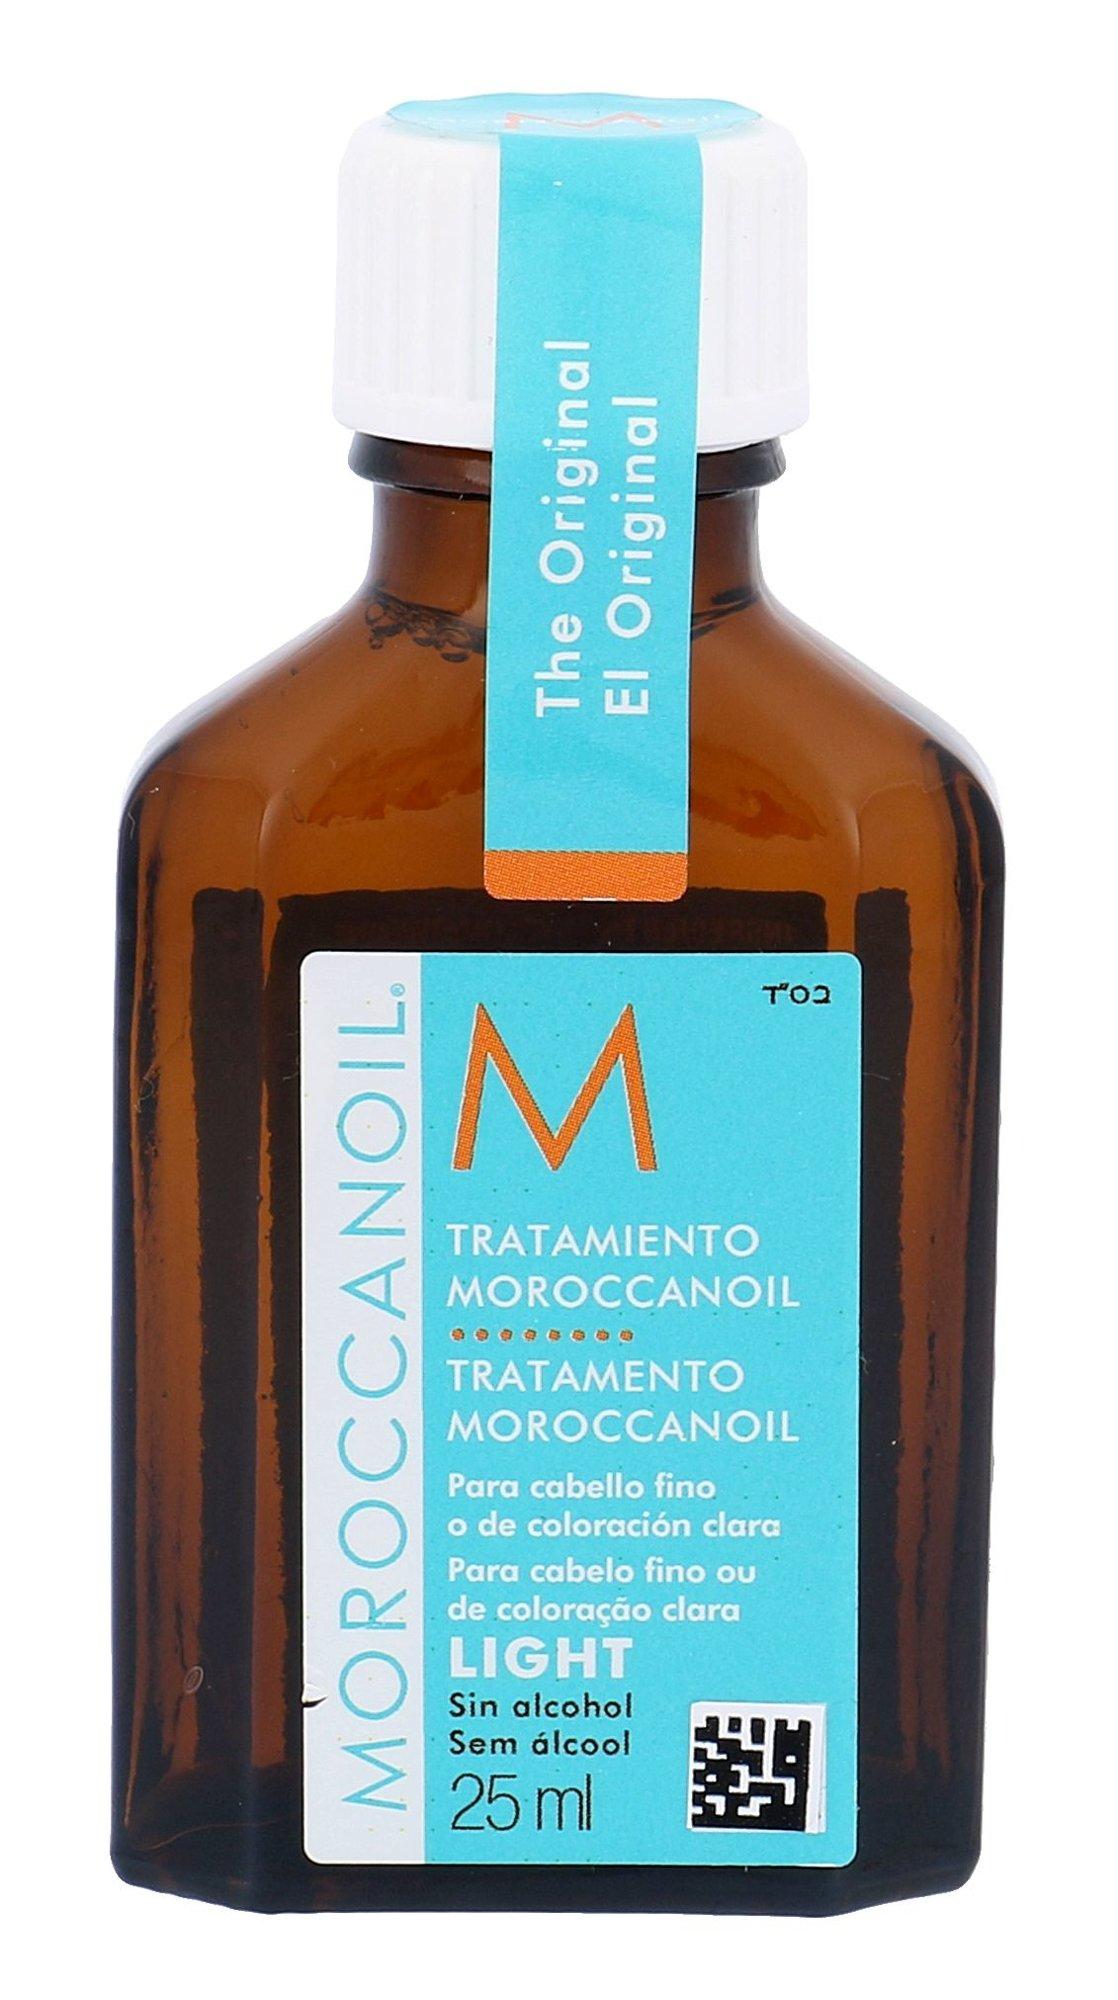 Moroccanoil Treatment Cosmetic 25ml